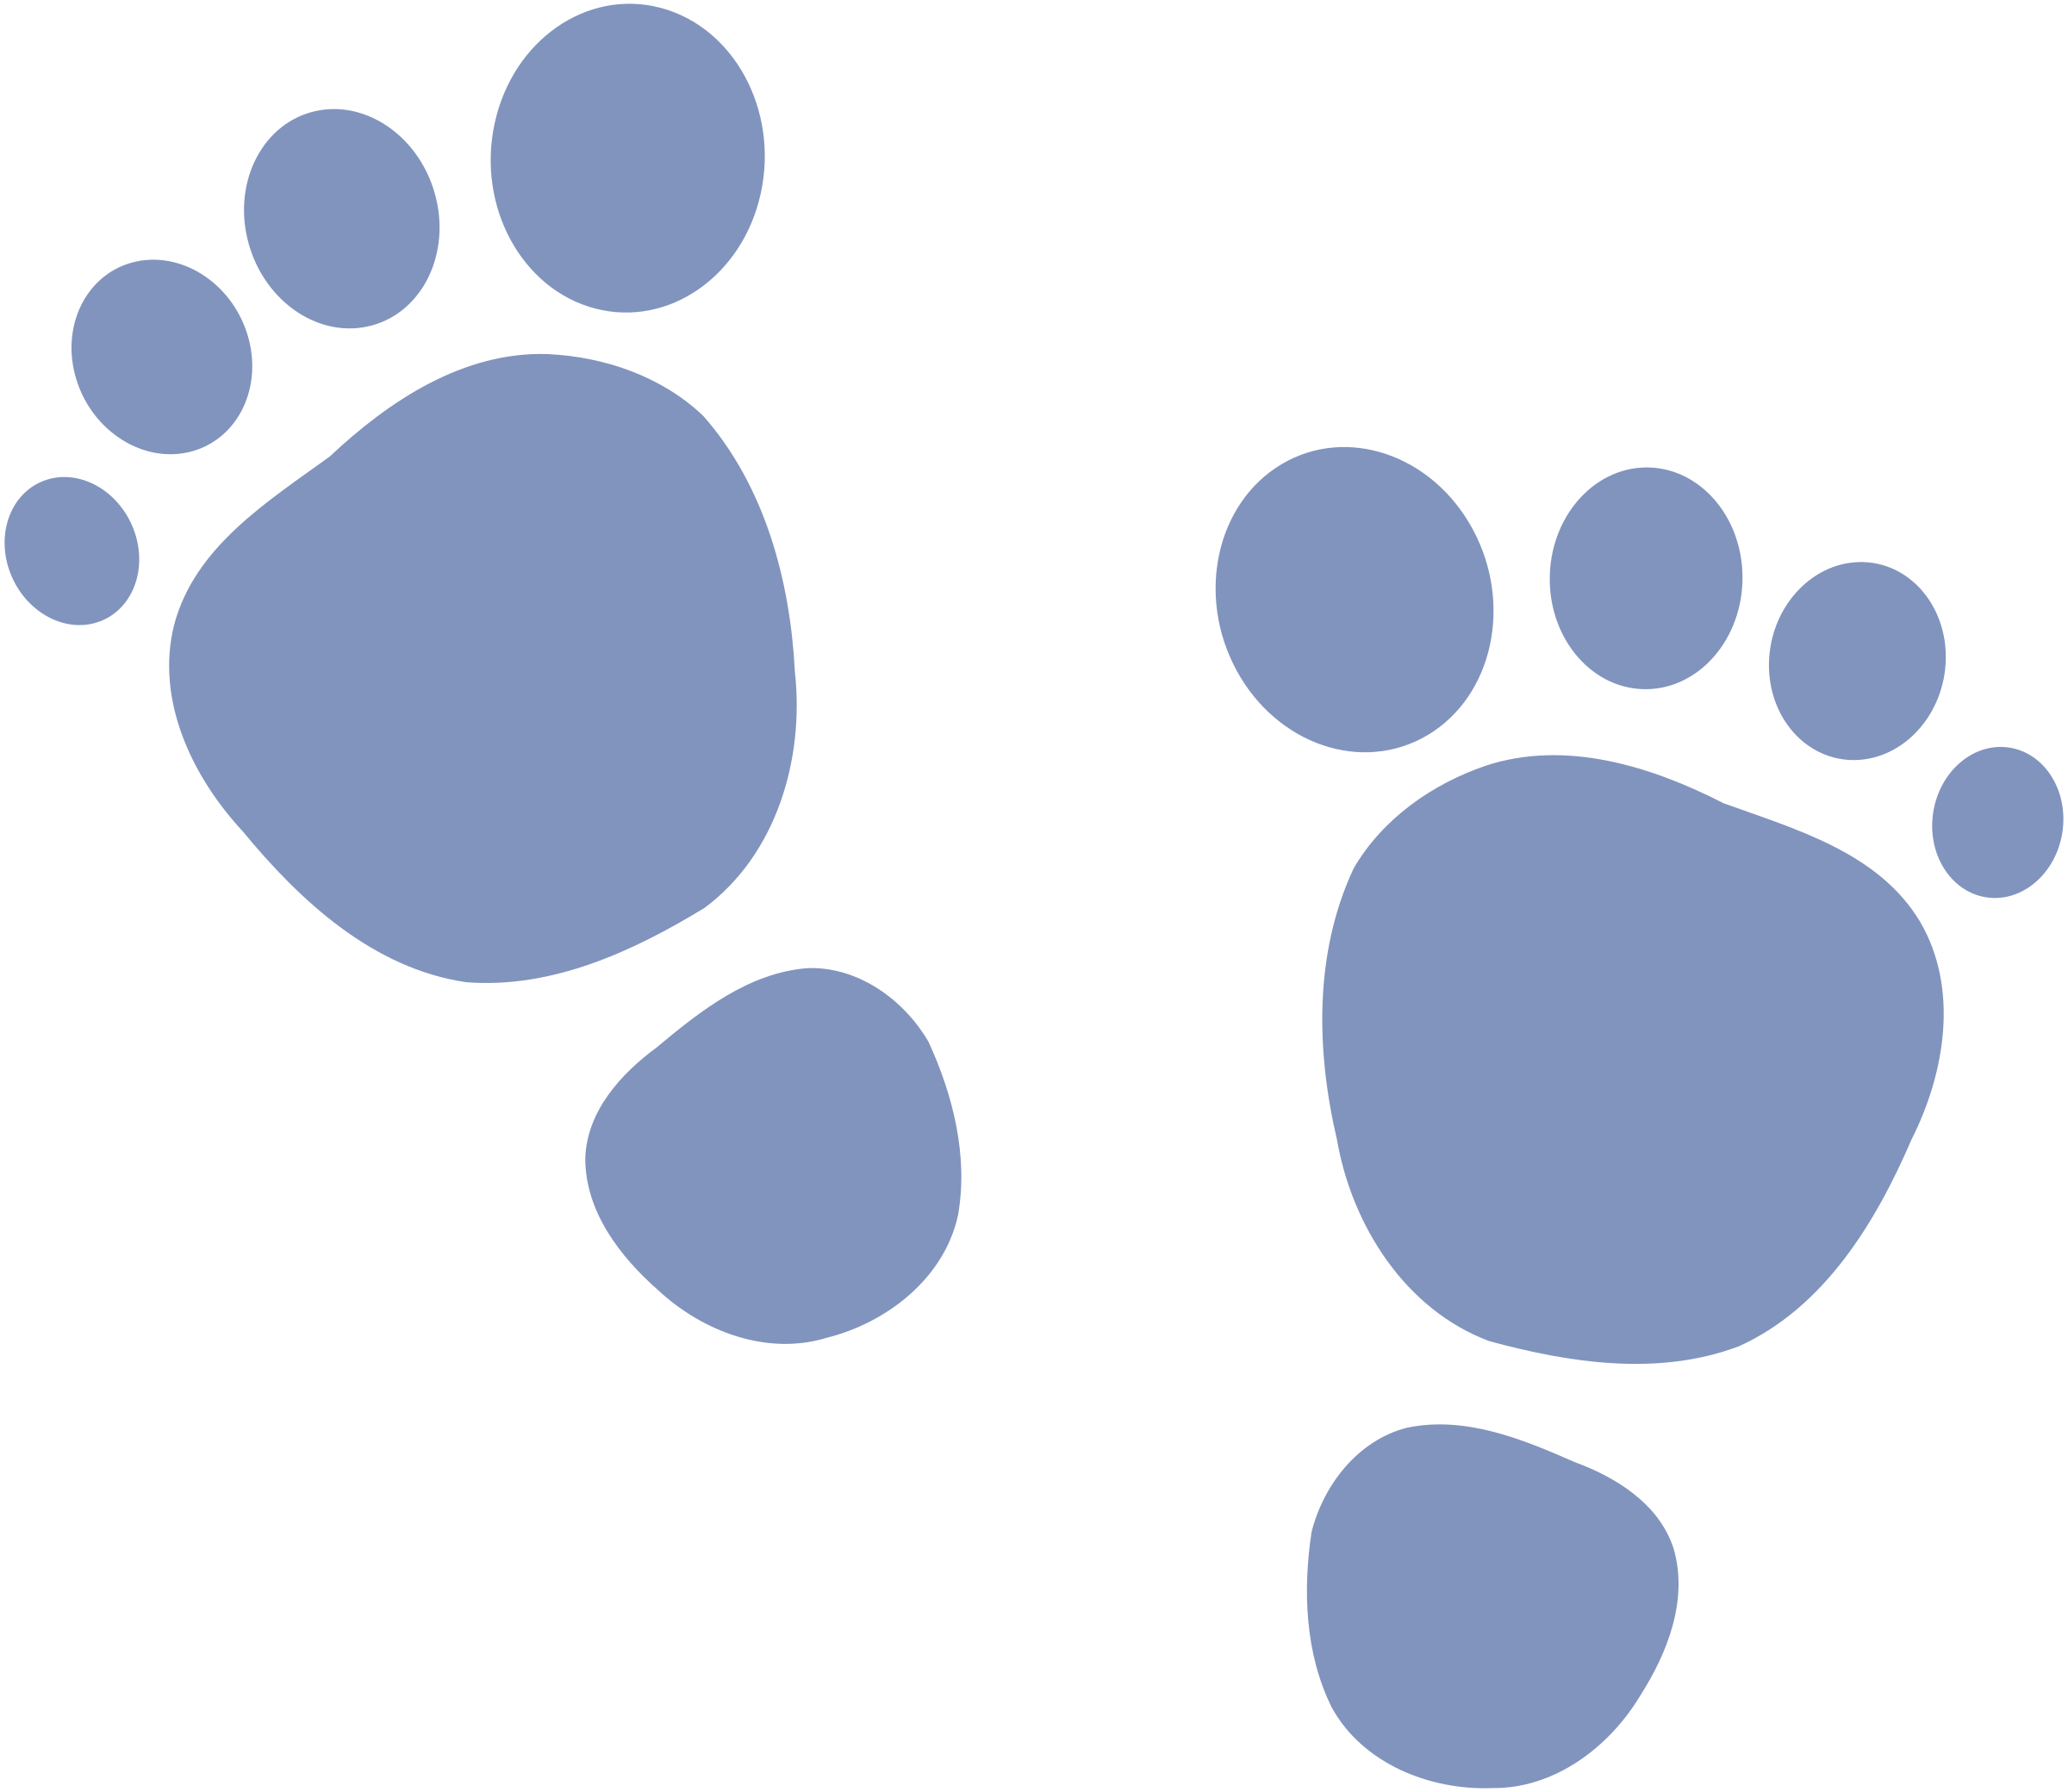 Feet clipart foot shape. H print big image